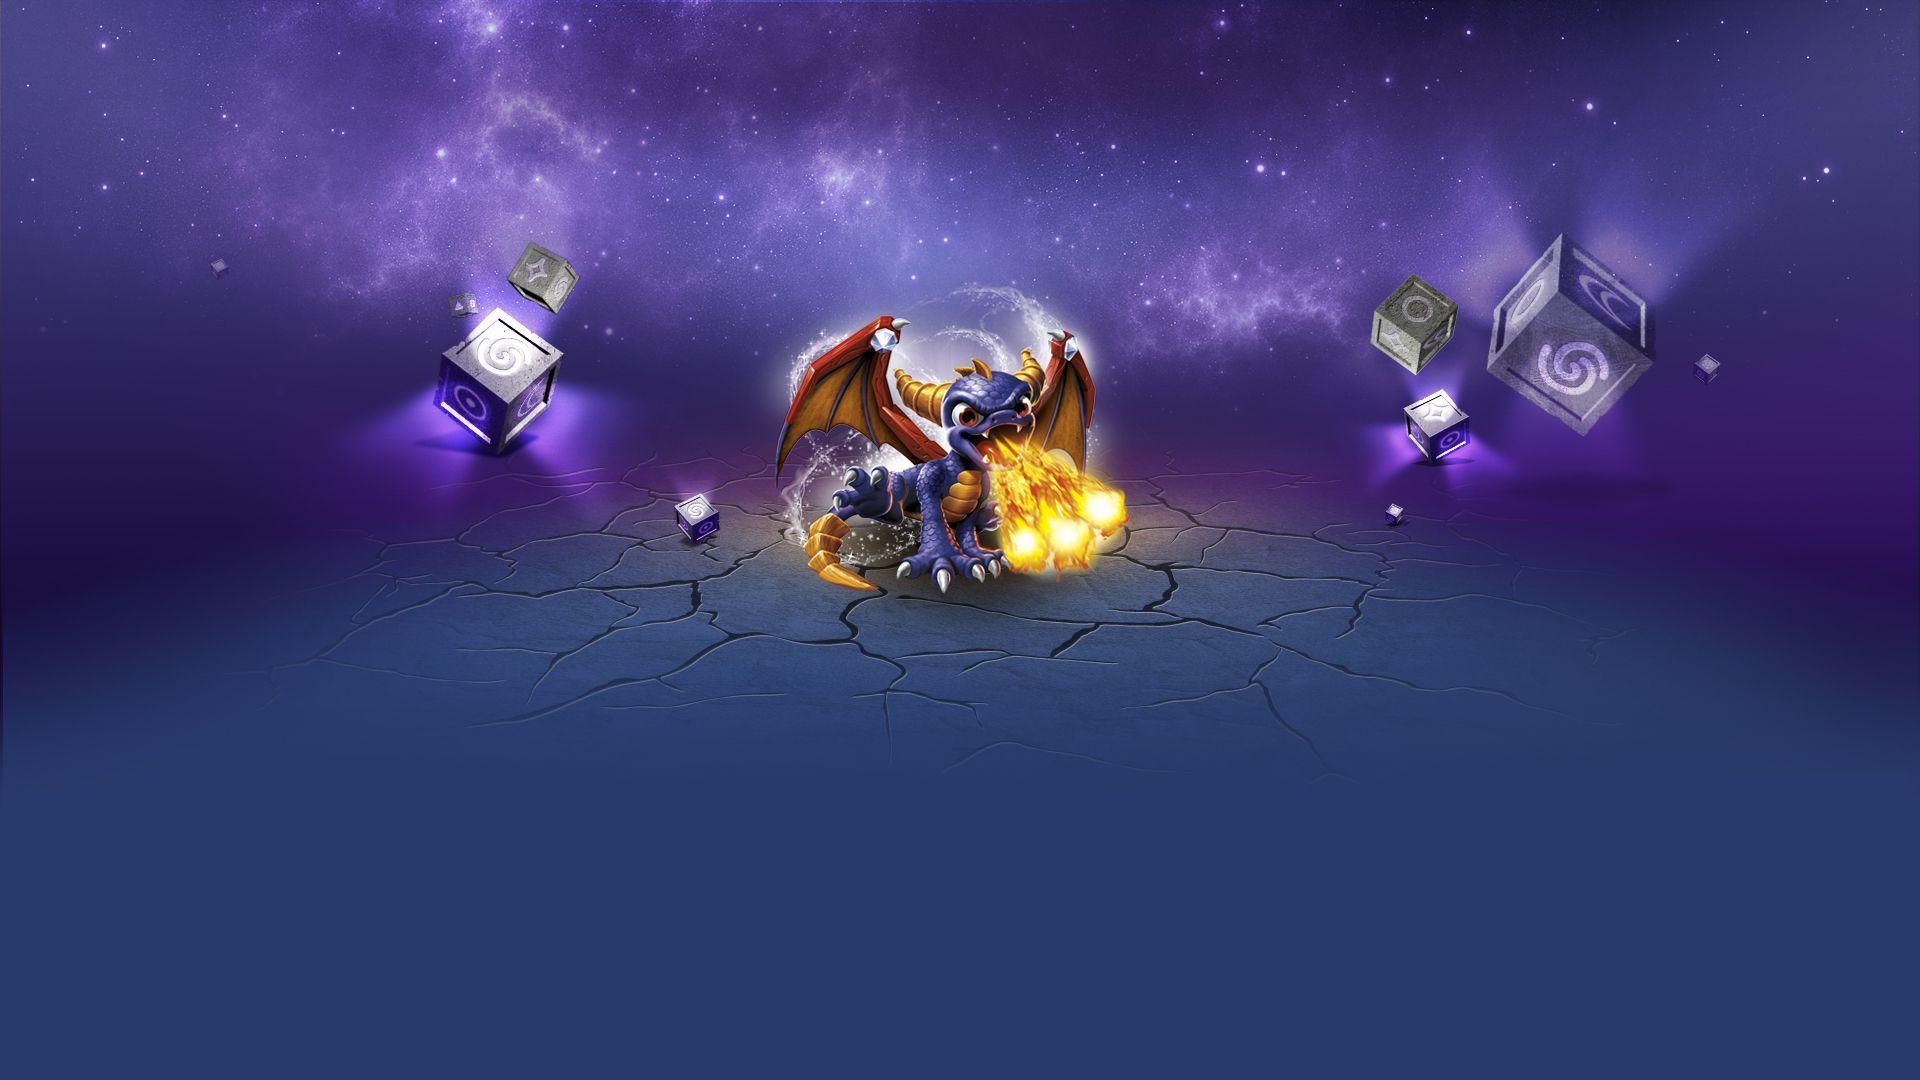 Skylanders Spyro Wallpaper Pictures